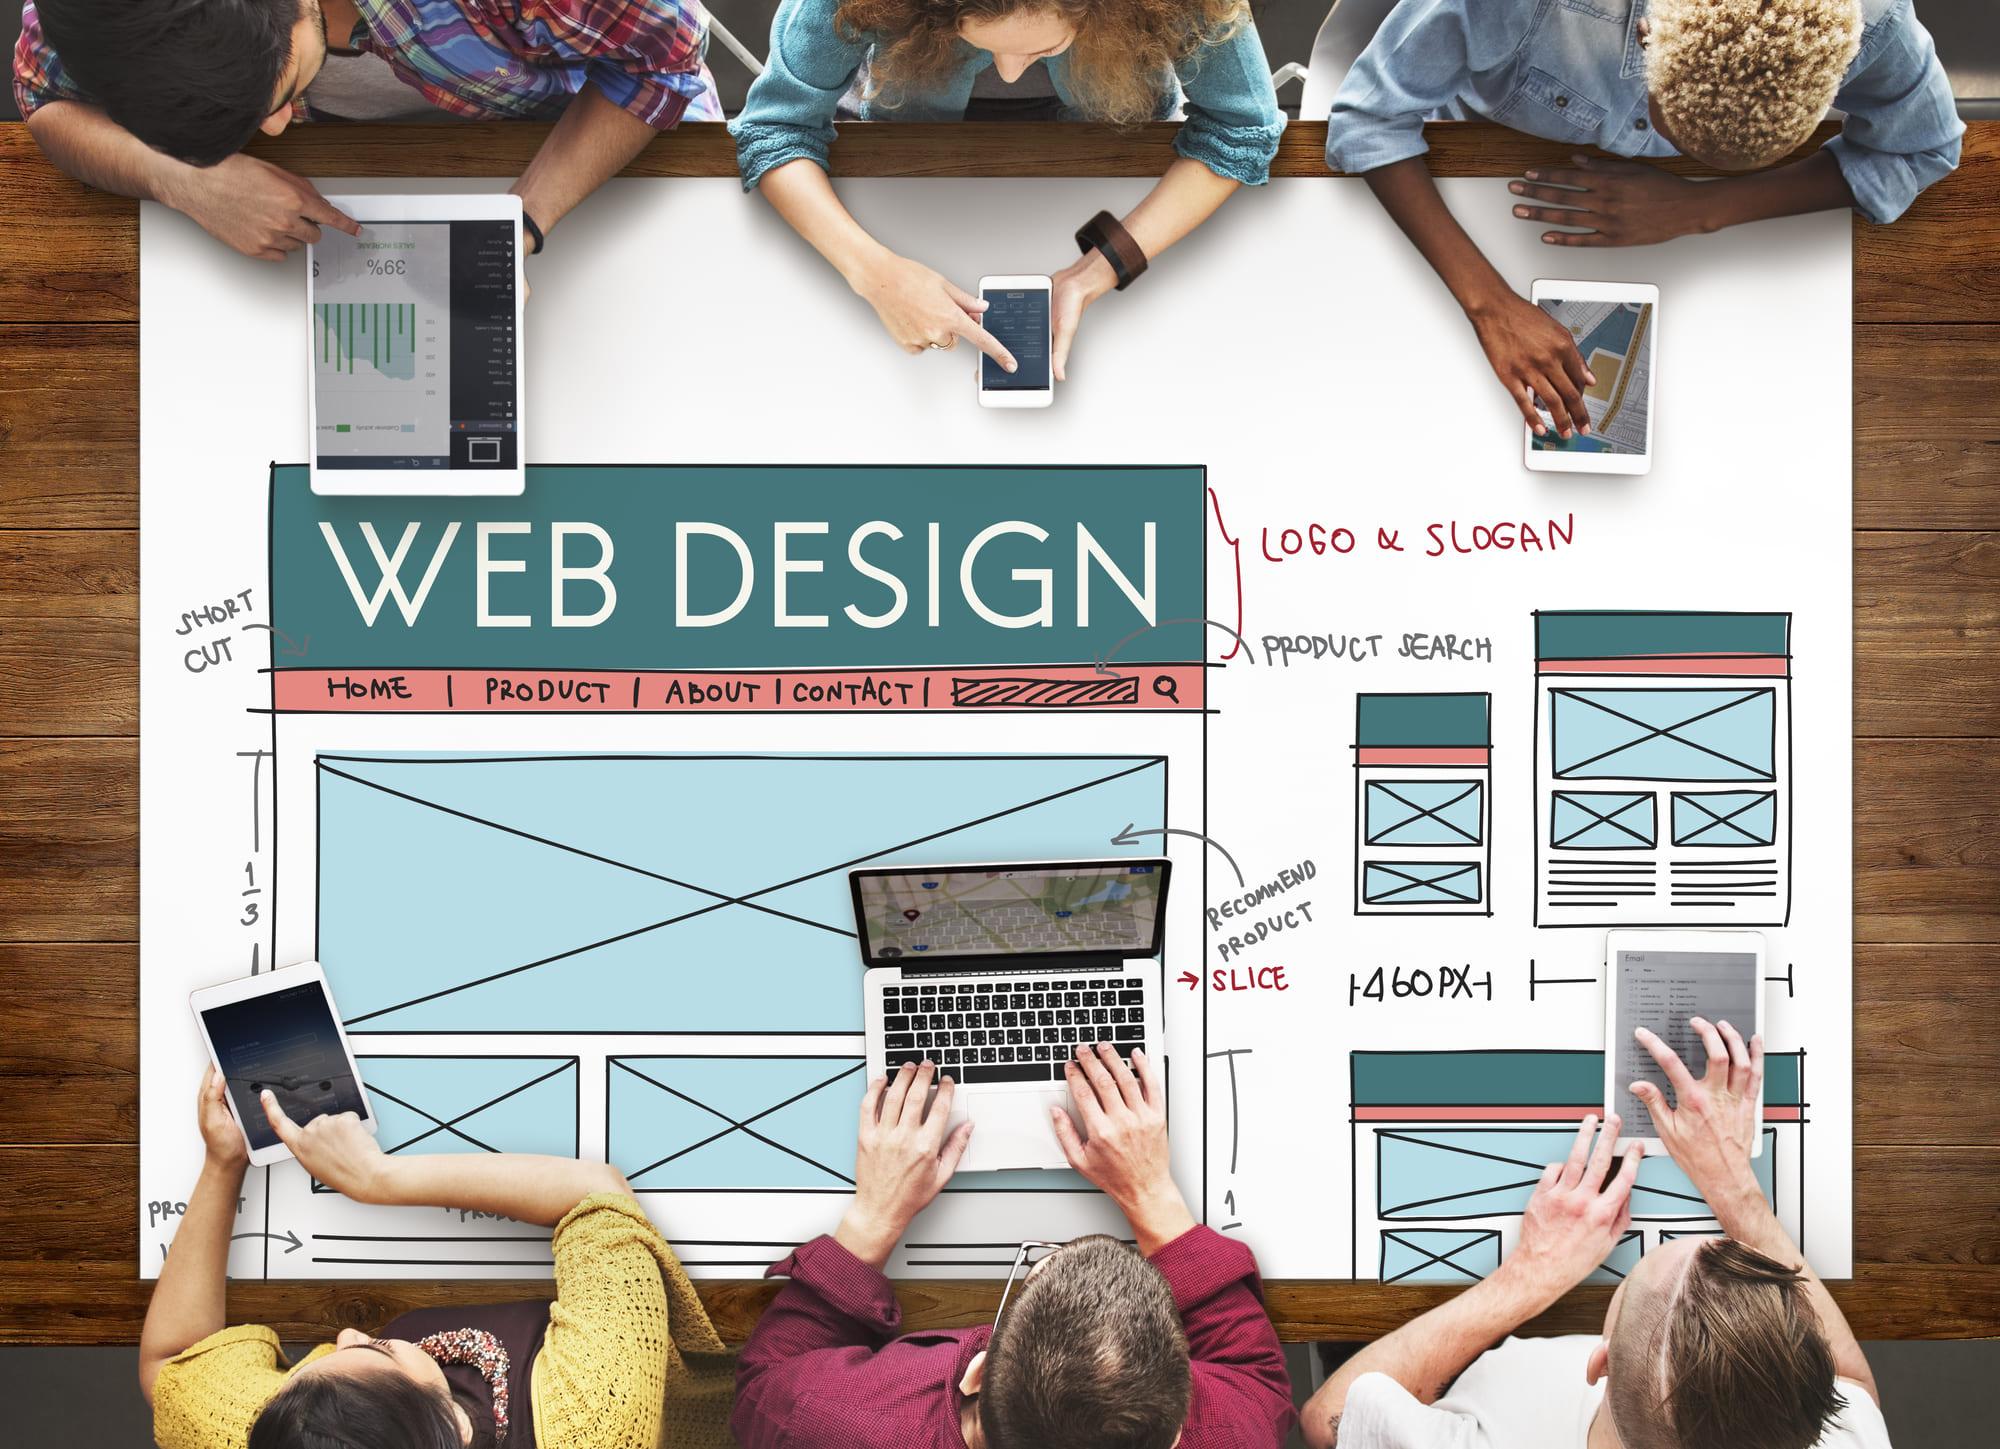 web designing team planning